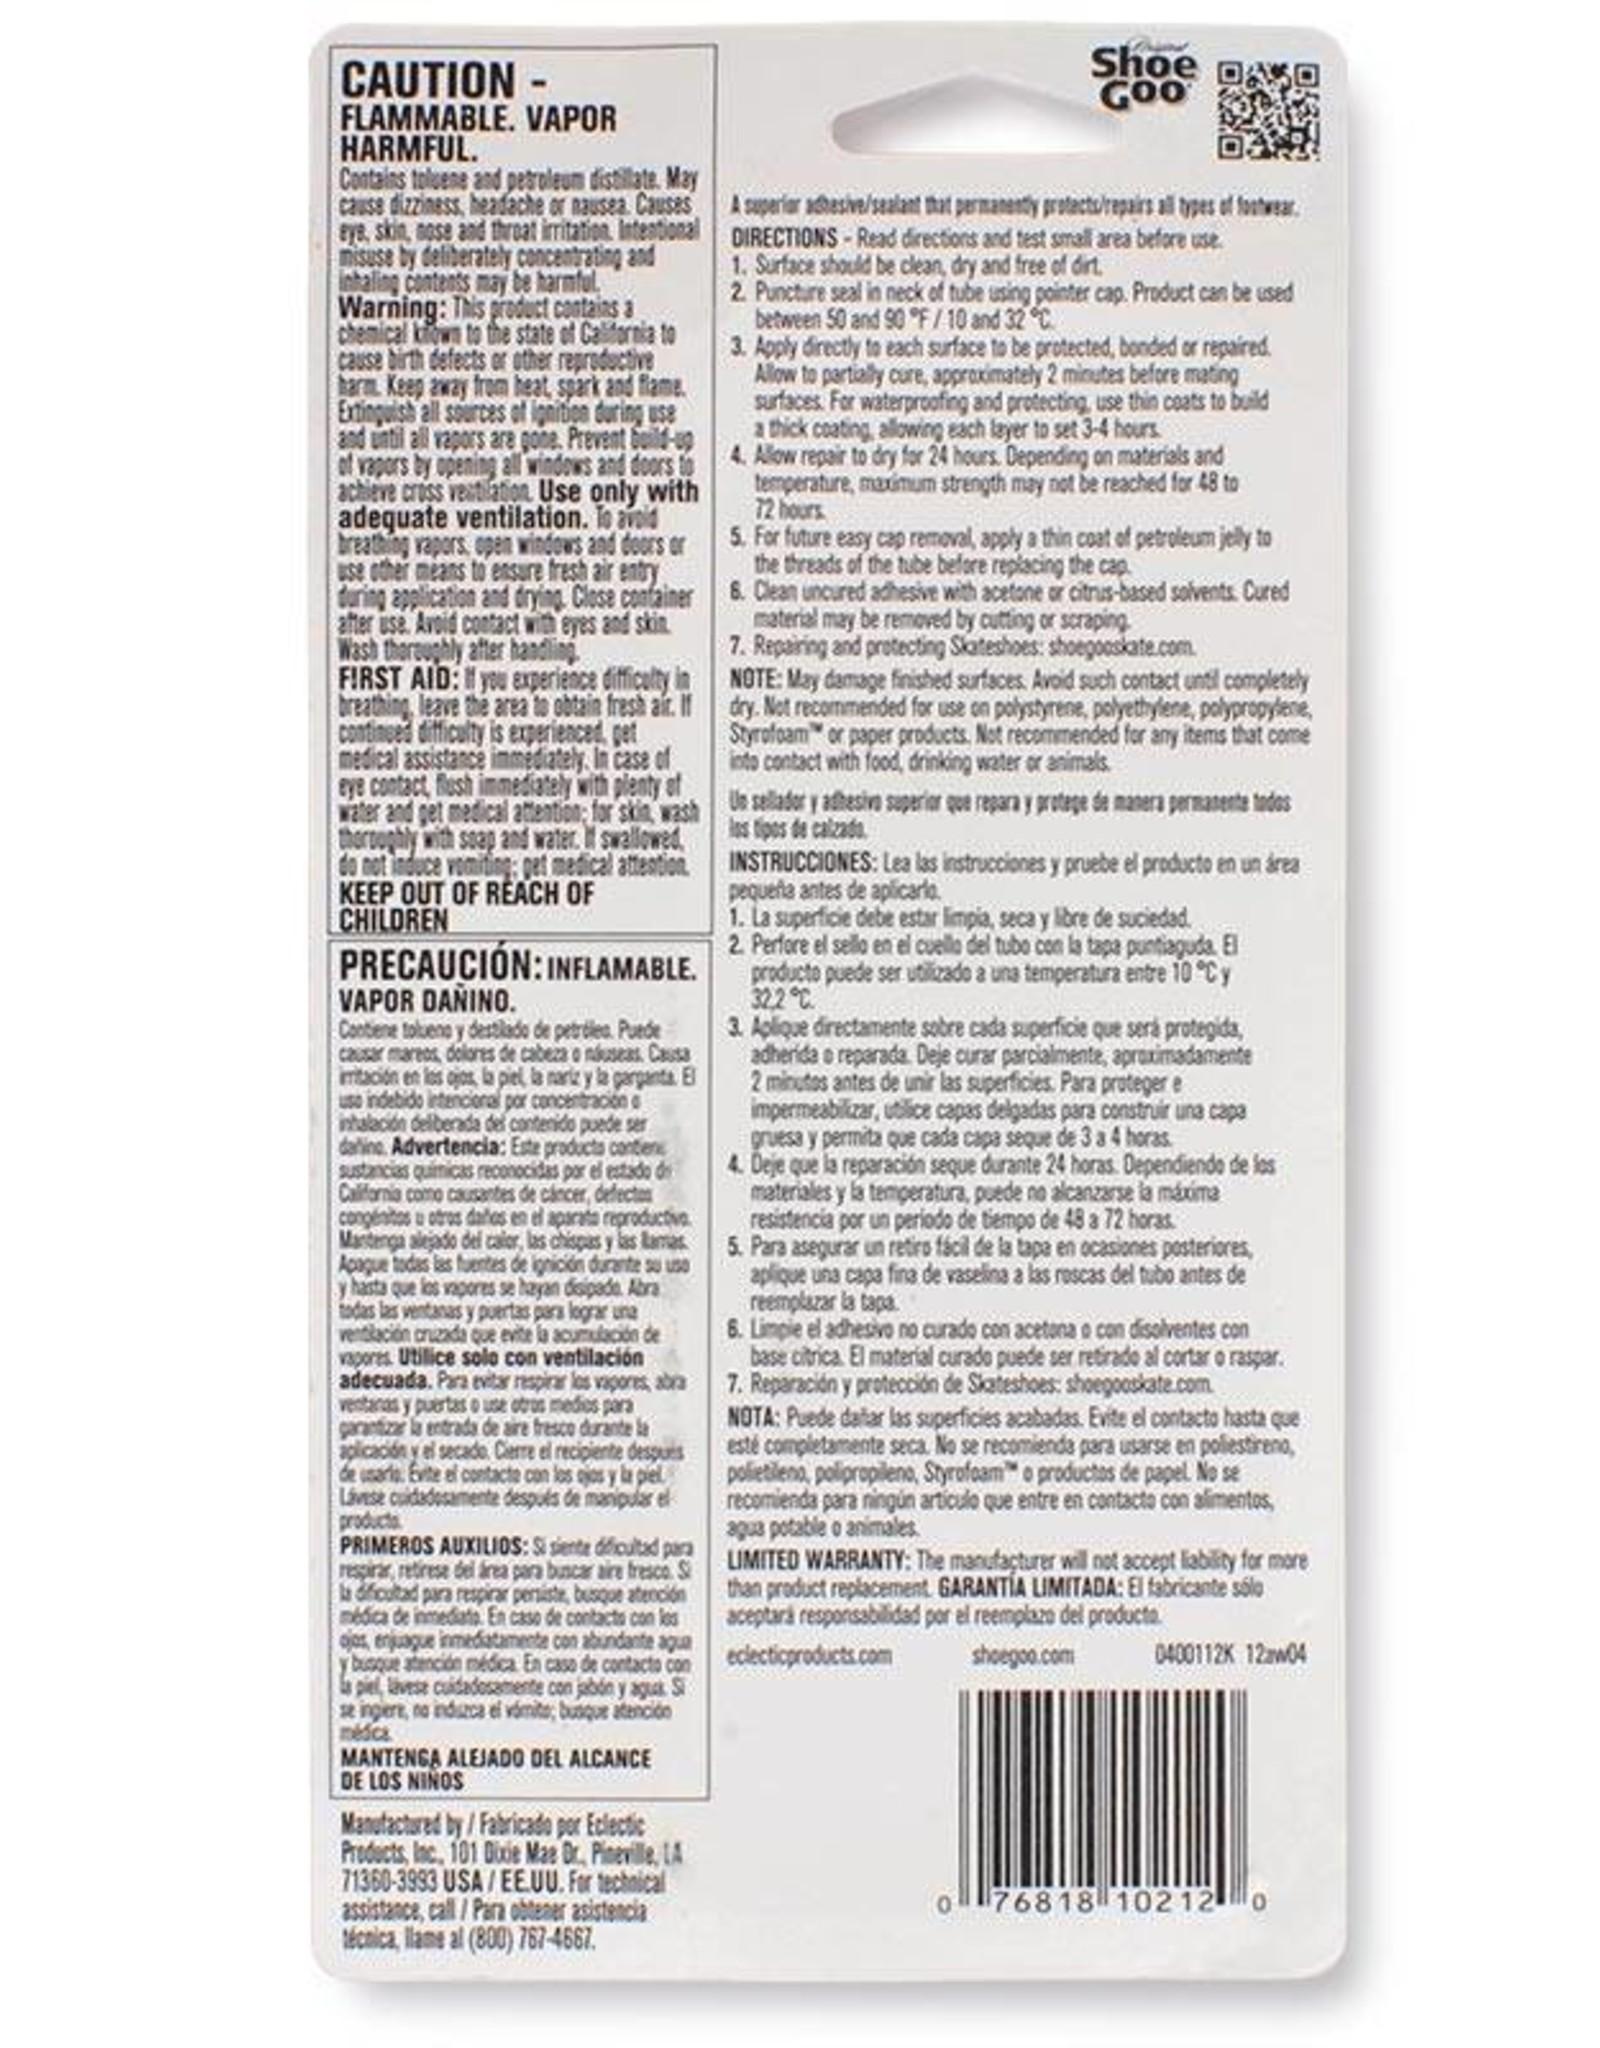 Shoe Goo Shoe Goo Original 110 ml Black 3-Pack with 15% Discount